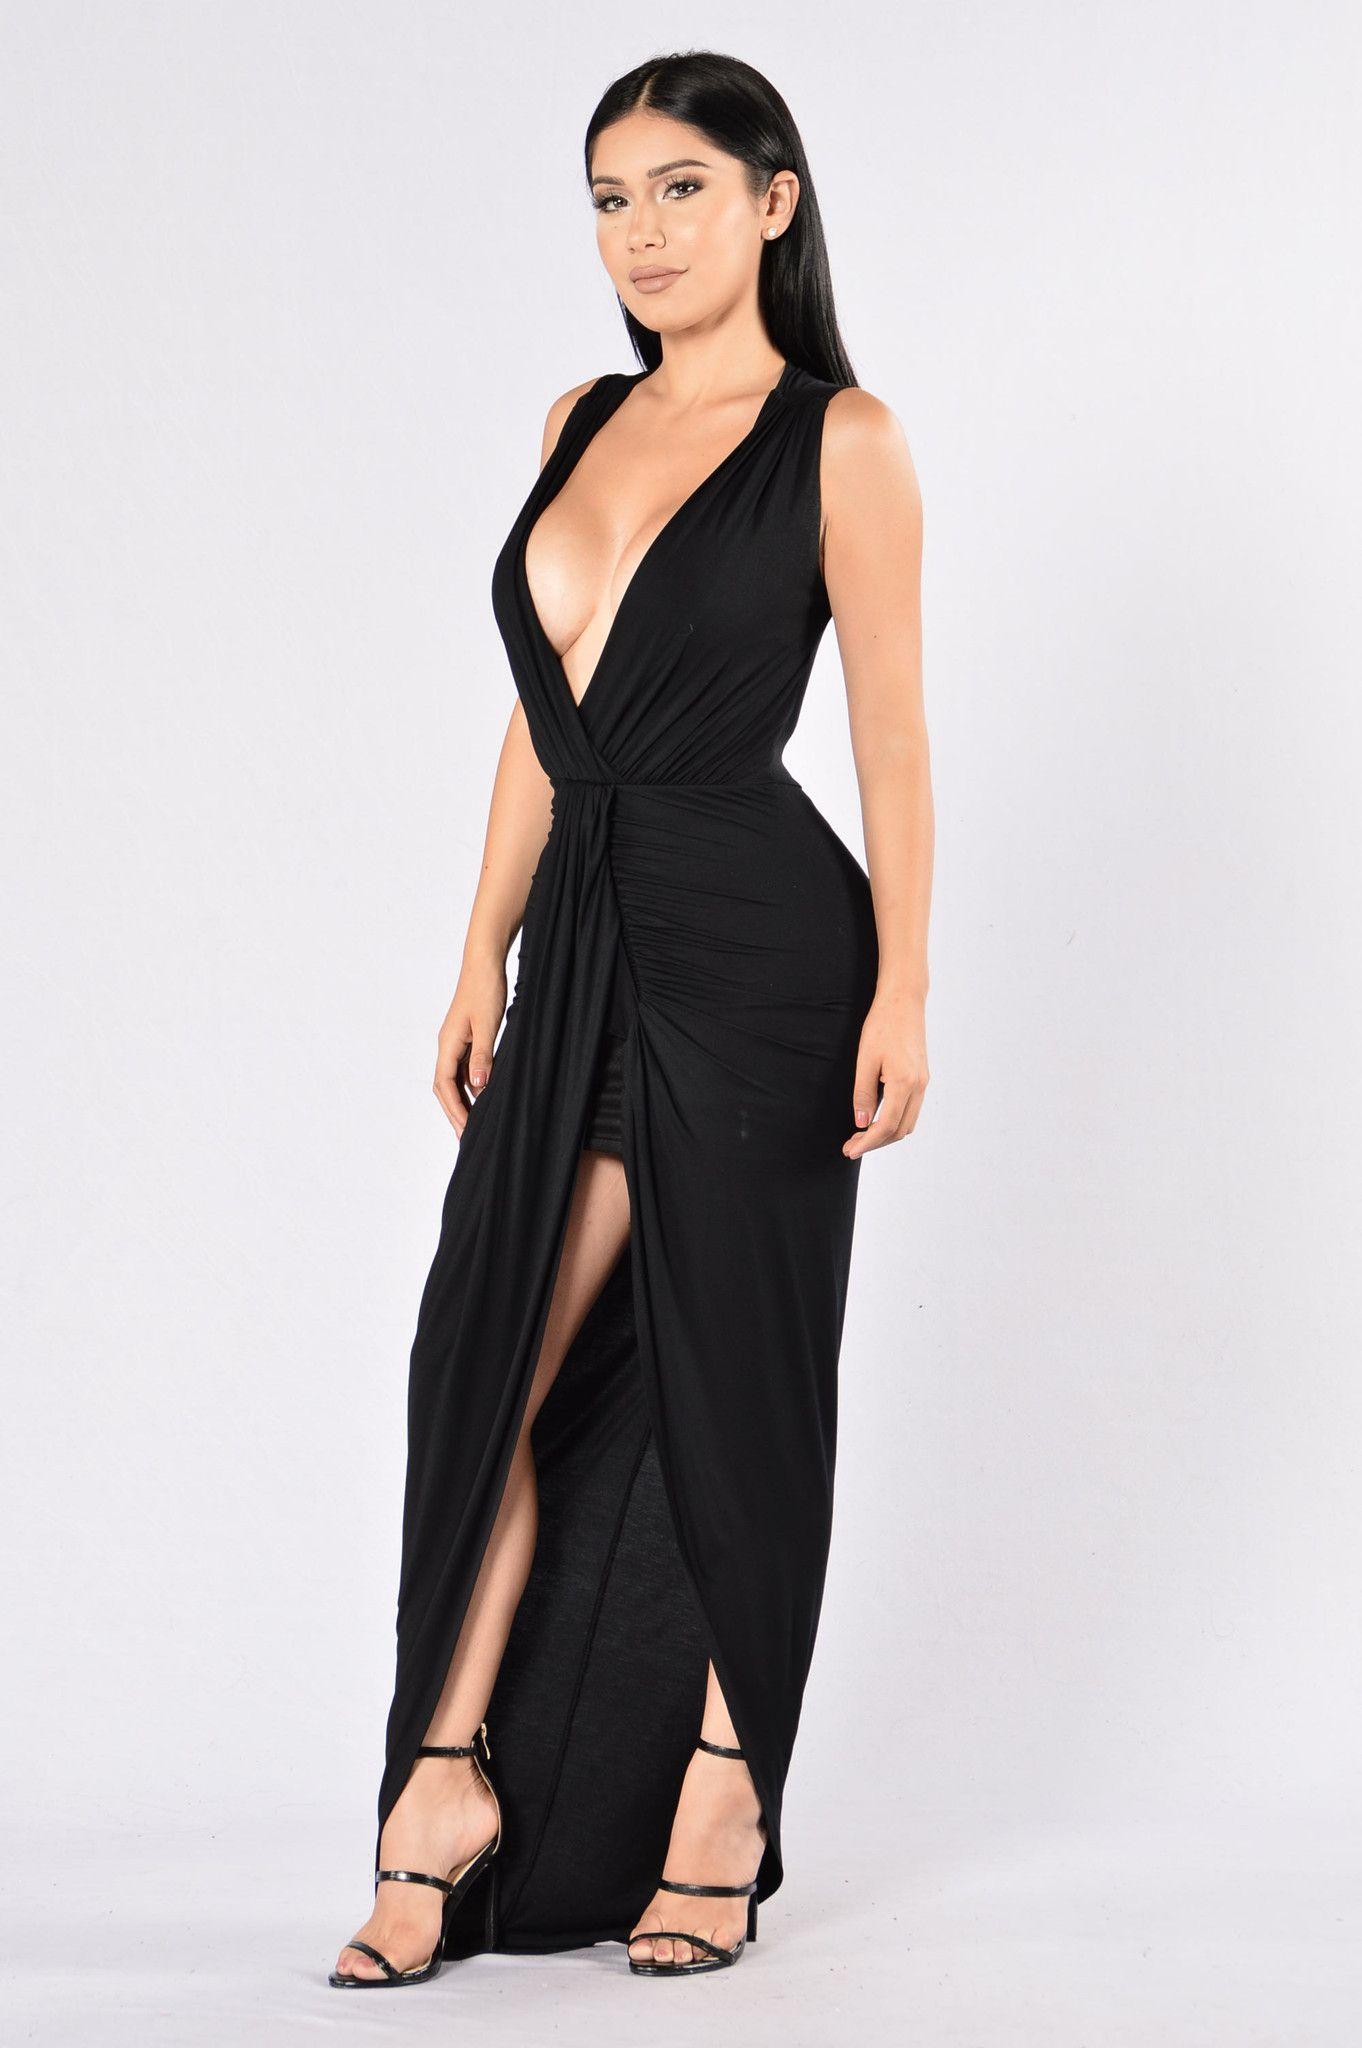 Mother Earth Dress - Black